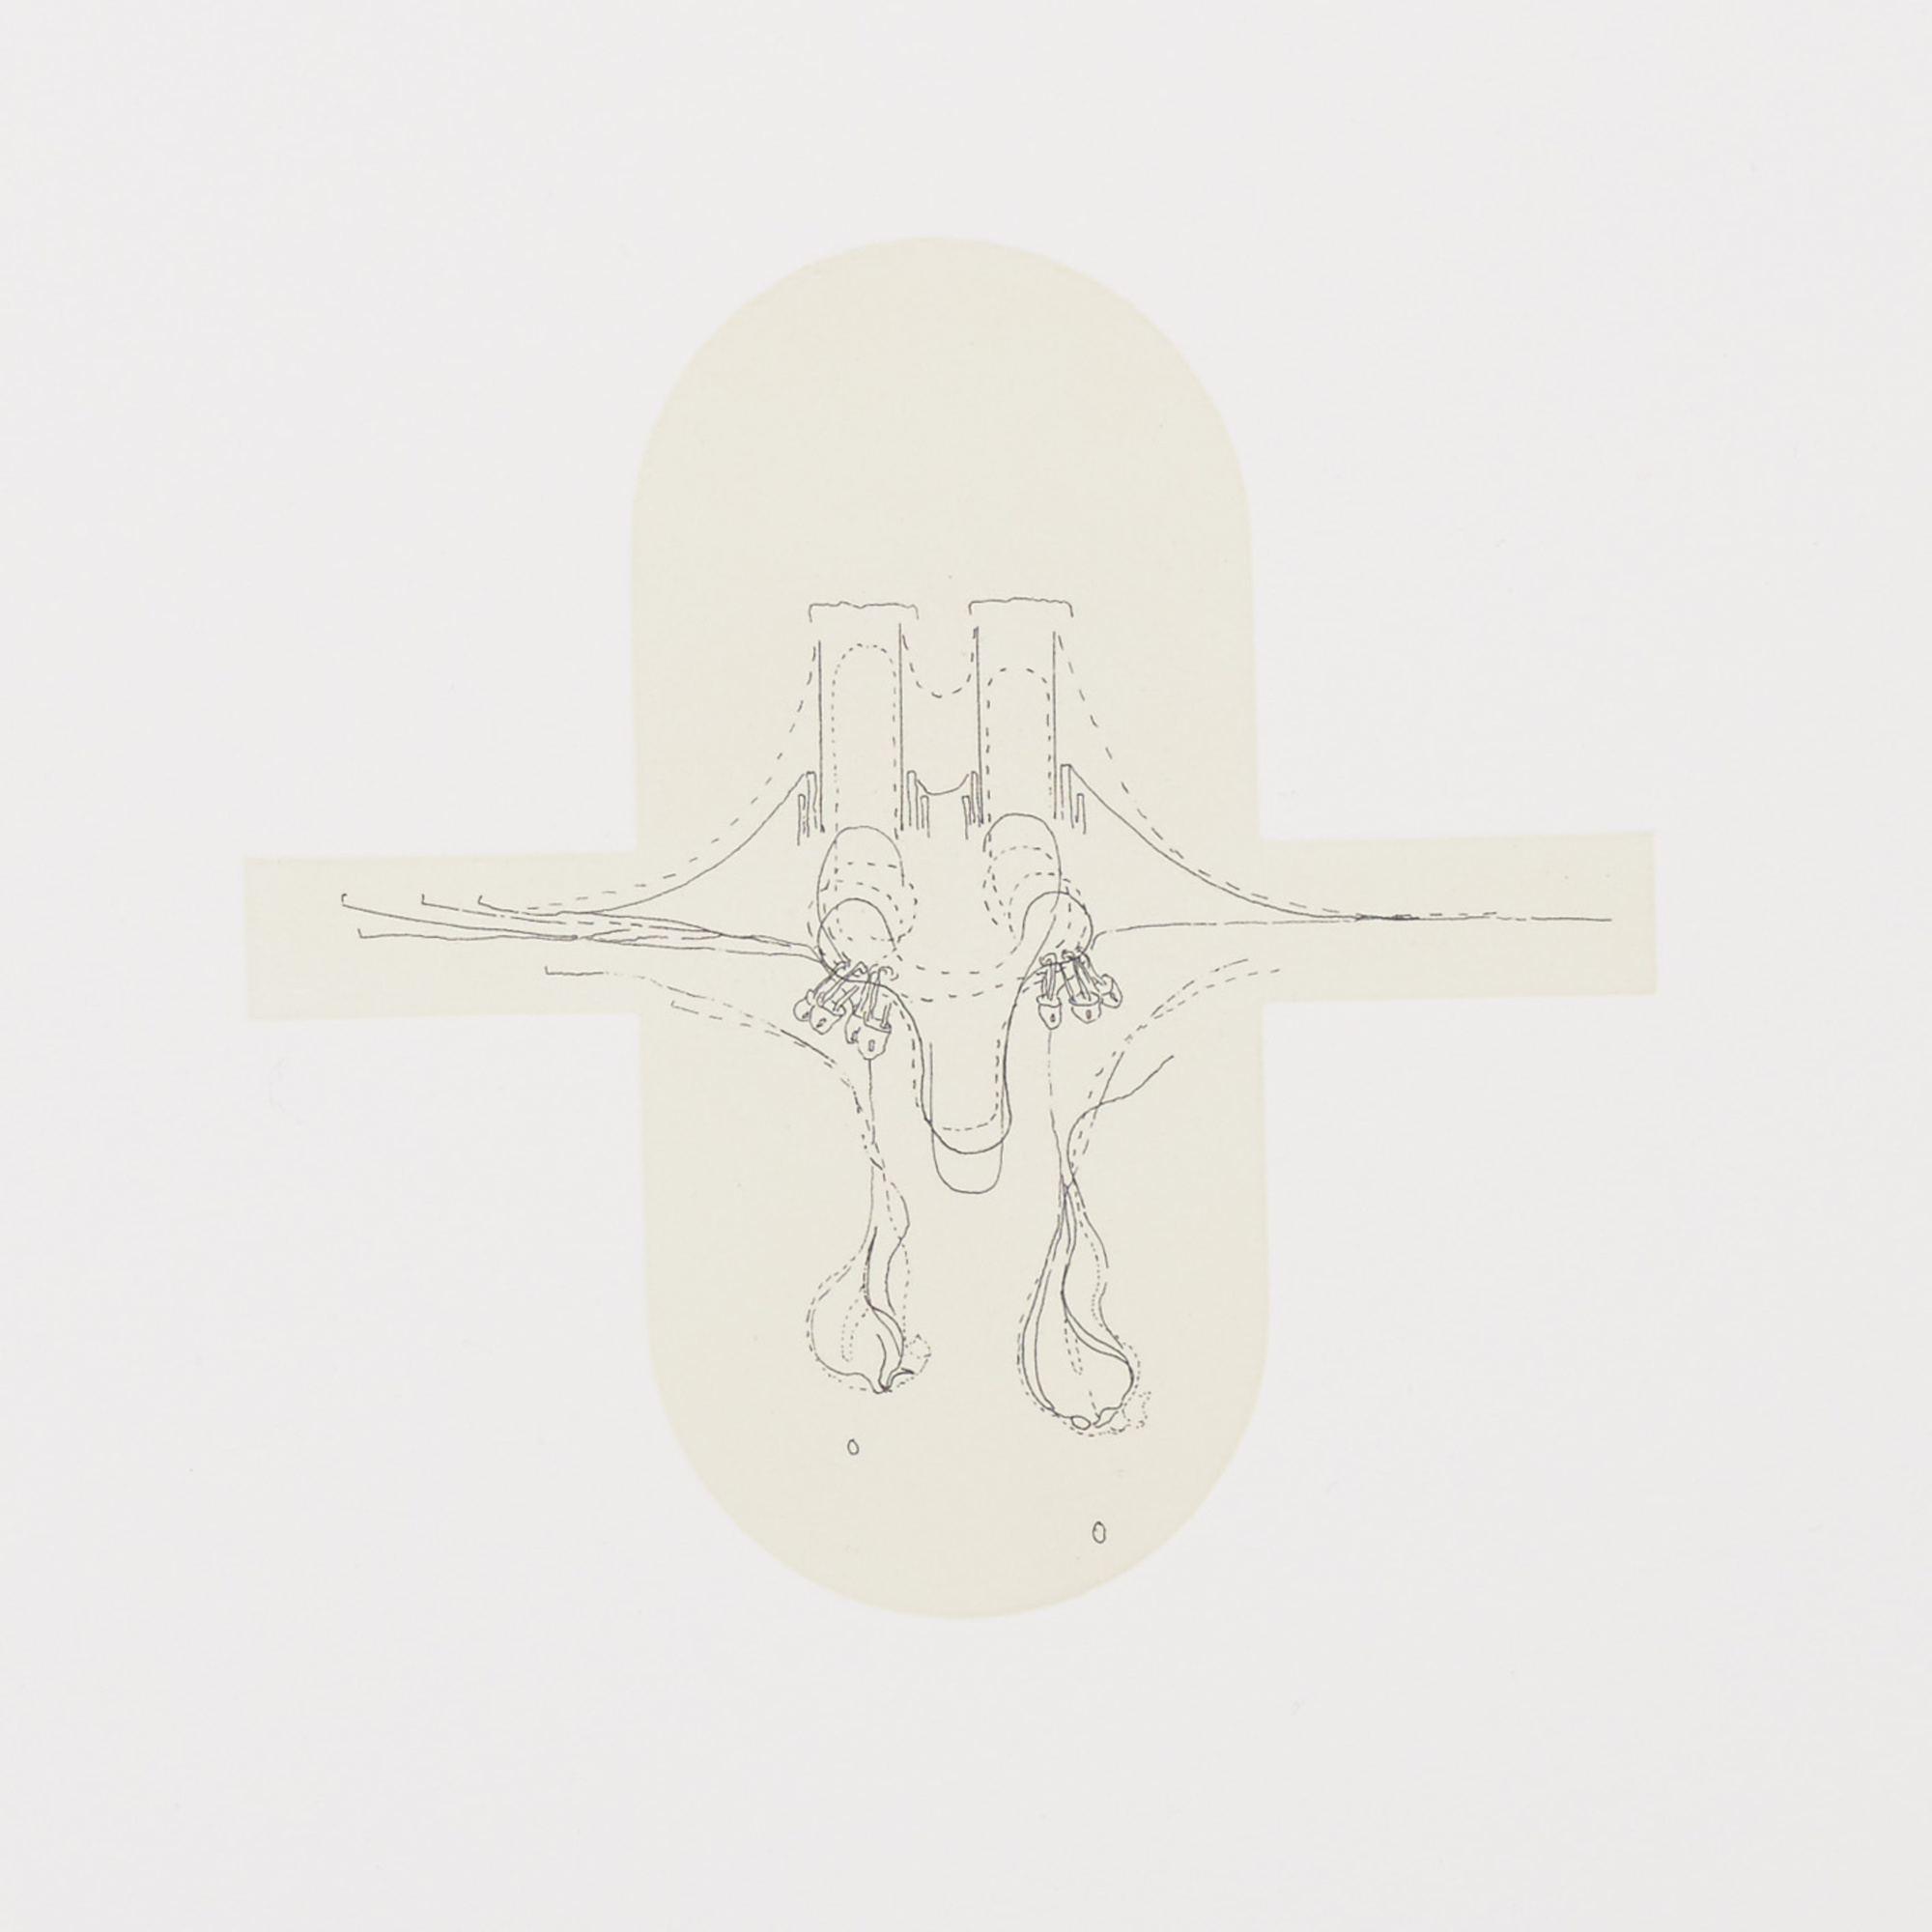 150: Matthew Barney / Cremaster: Field Suite (portfolio of five works) (3 of 3)